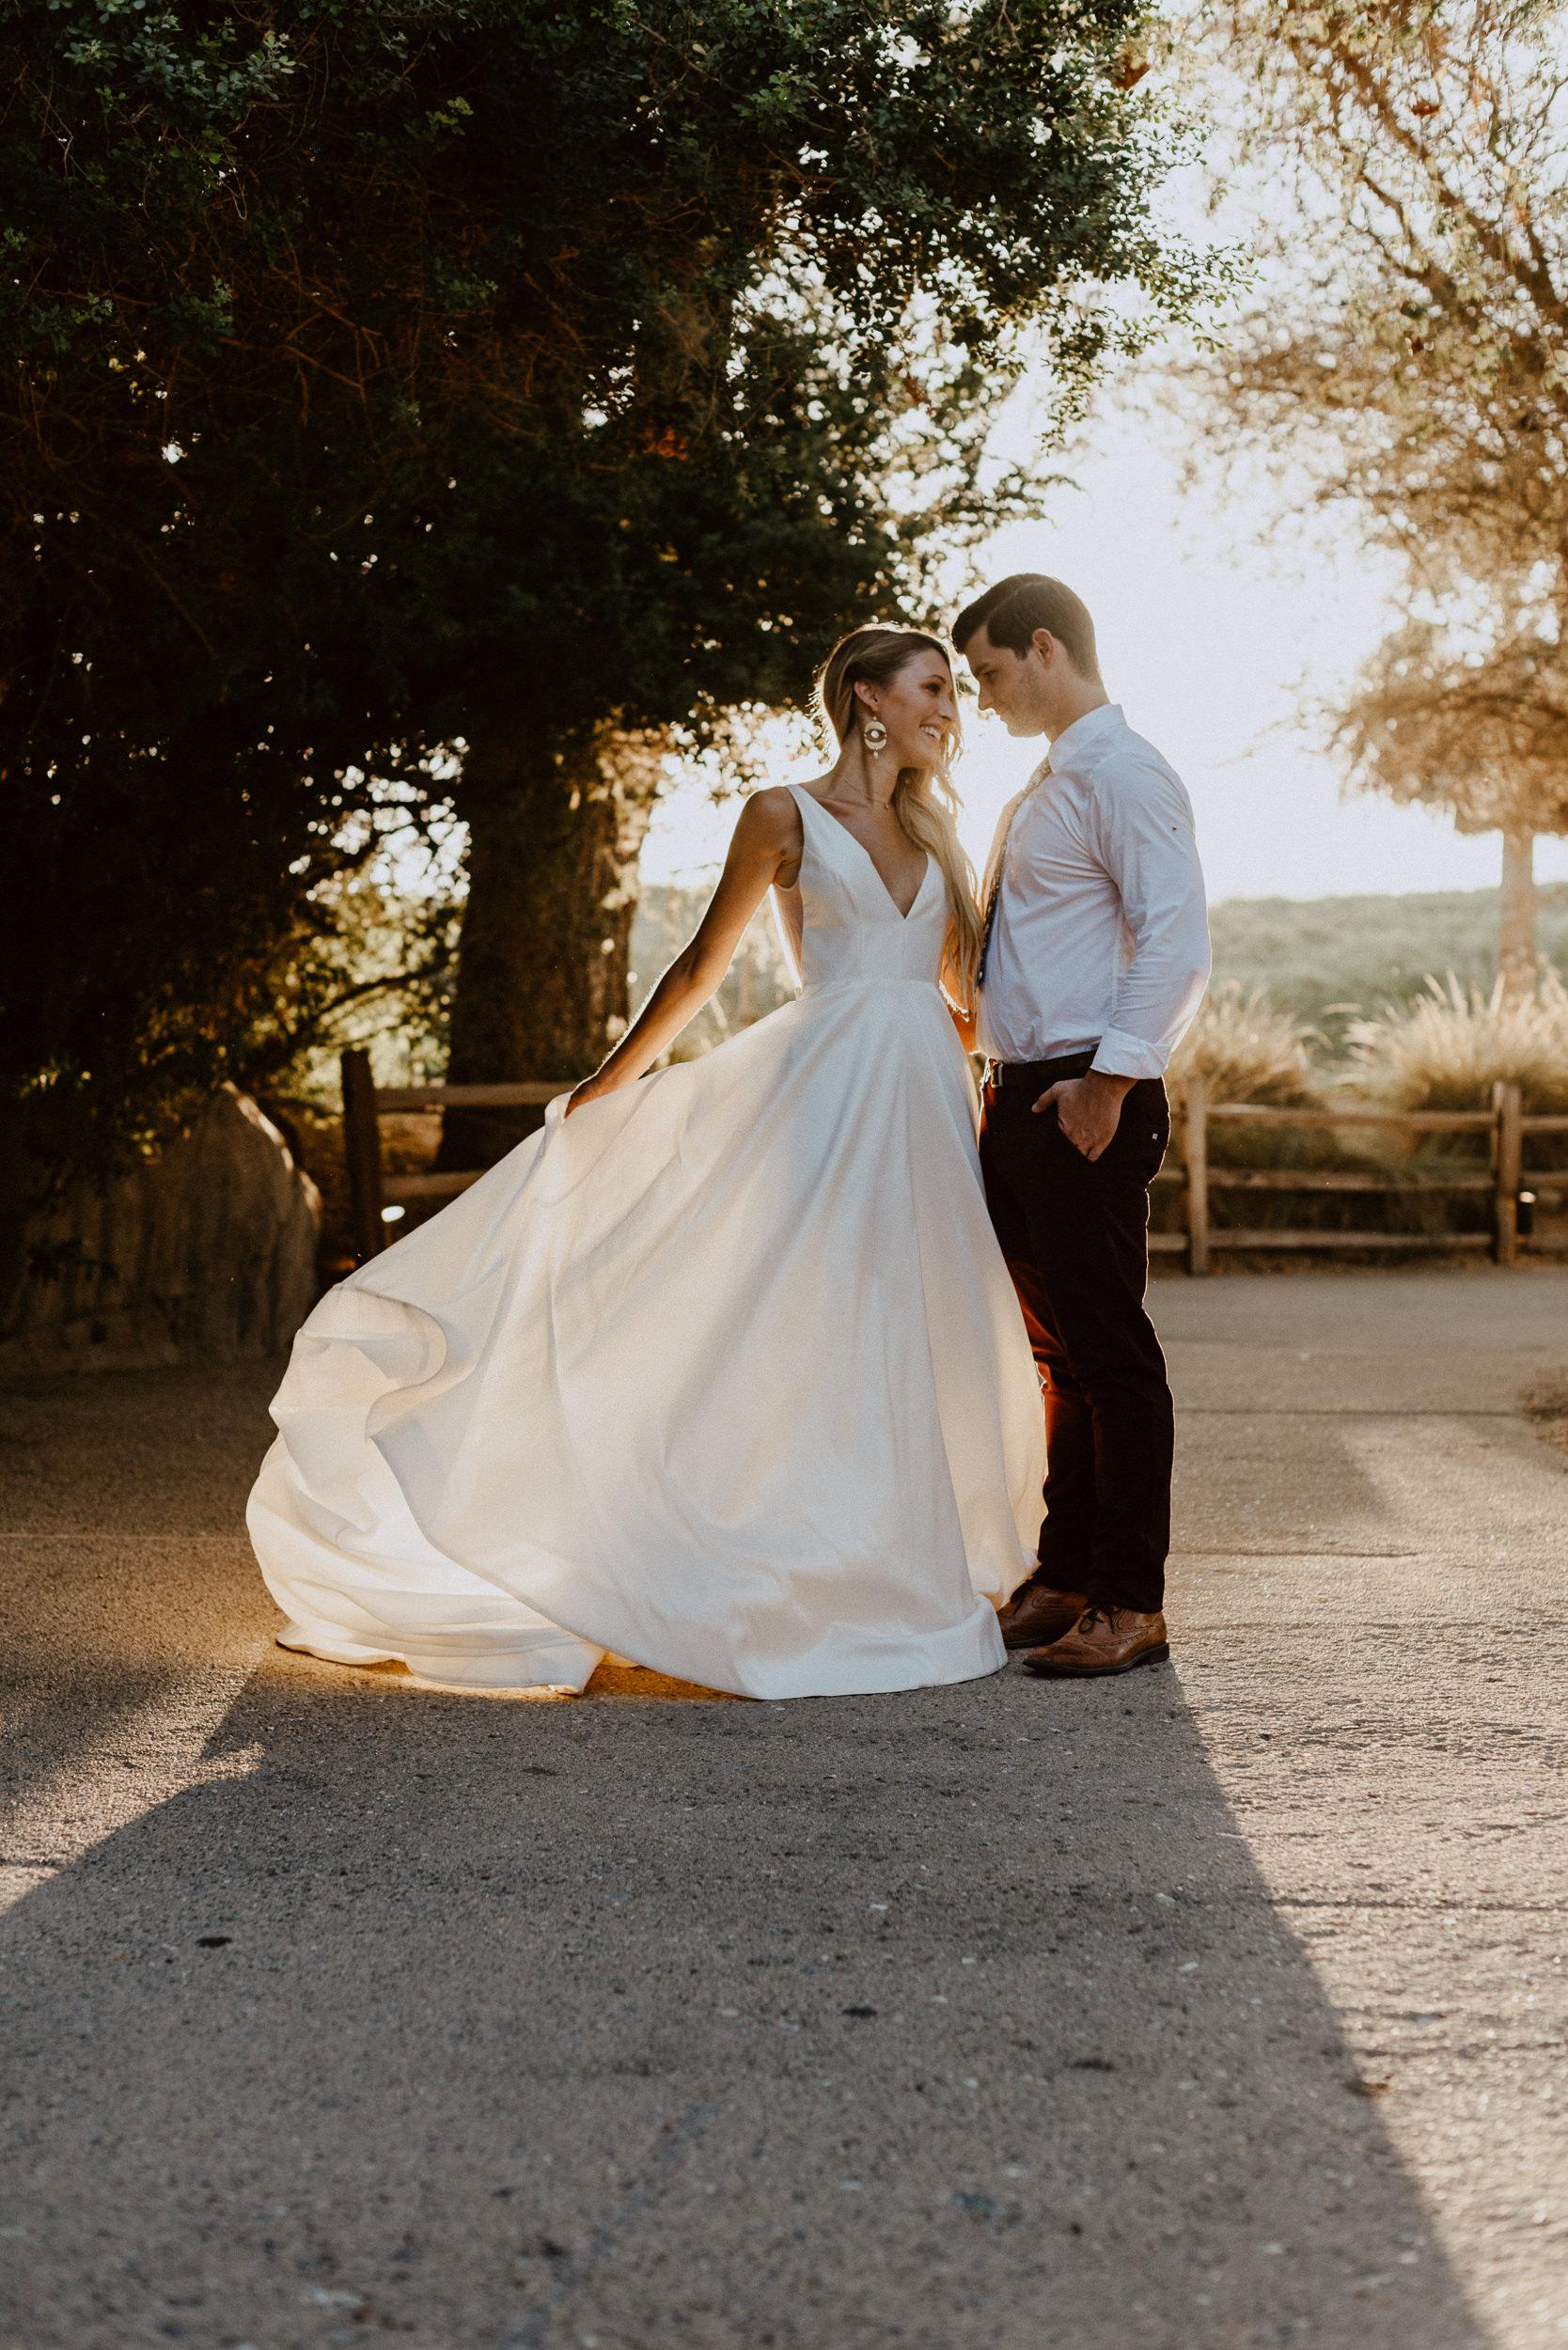 sChelsie + Chris - The Desert Shootout Wedding Romantics at The Living Desert-152.jpg